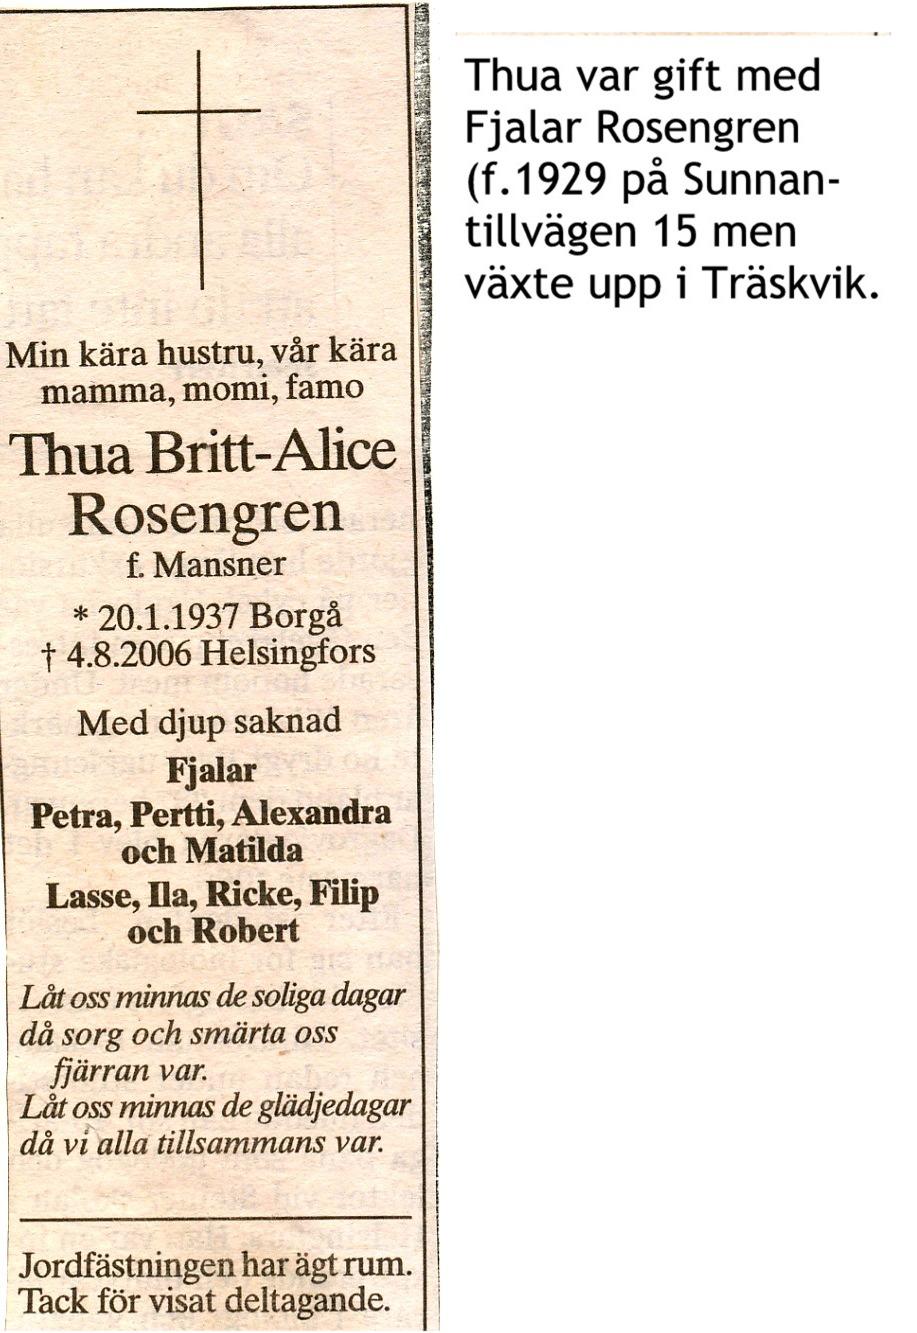 Rosengren Thua